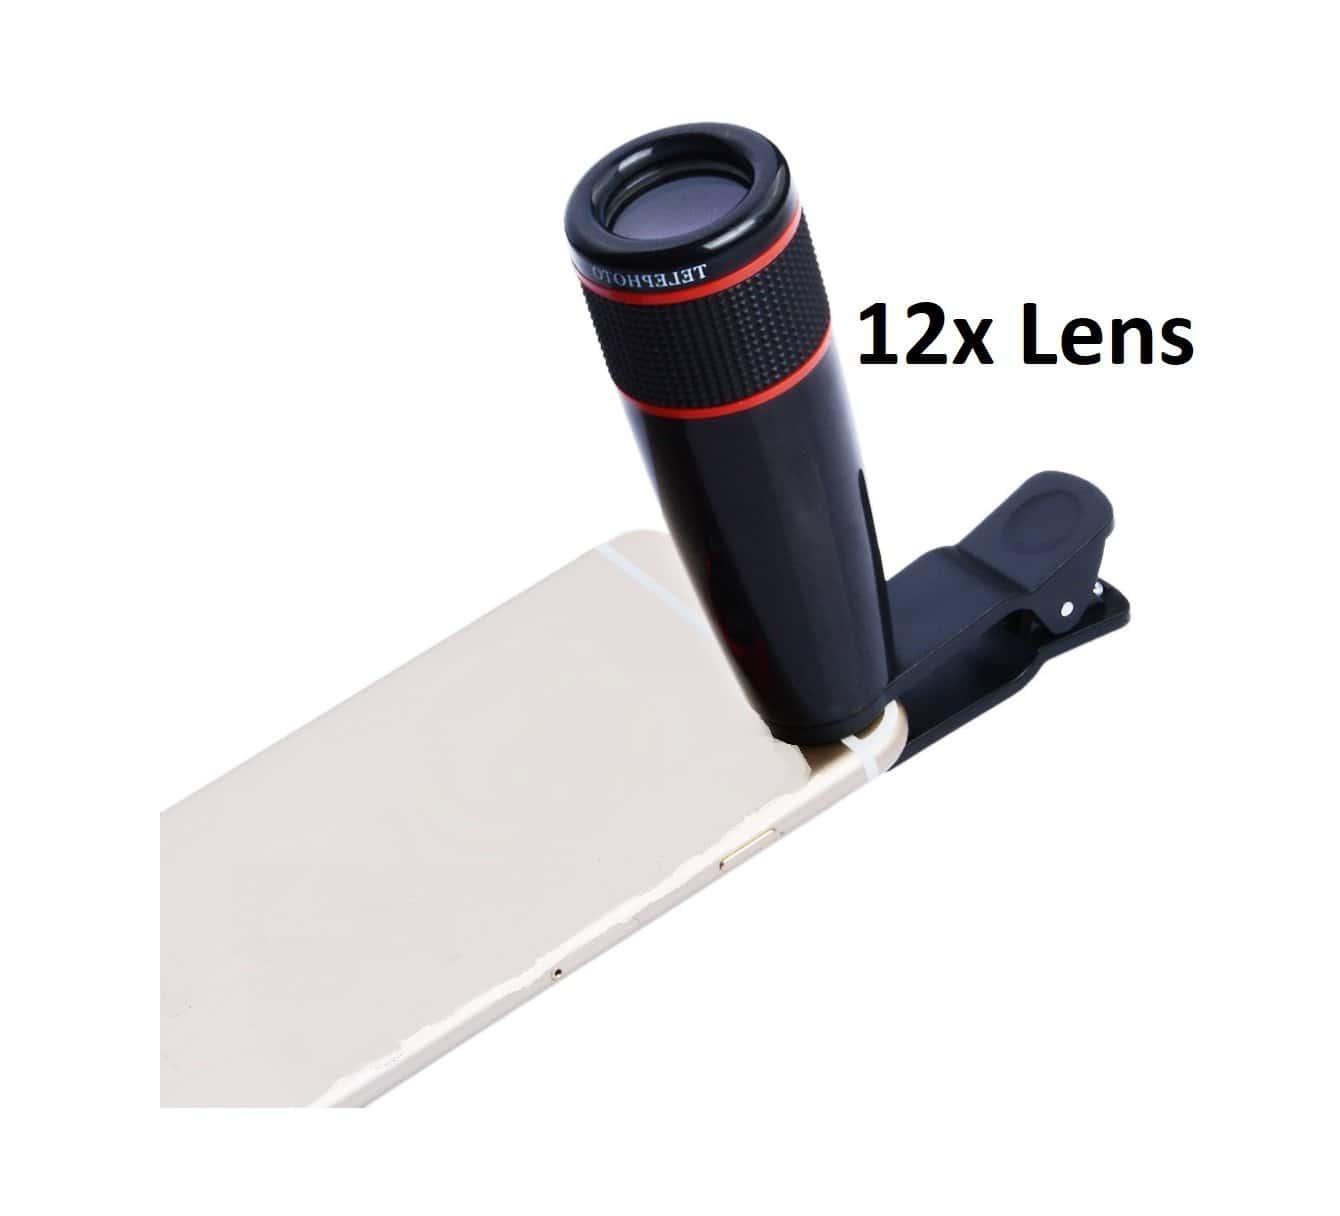 12x mobile camera lenses